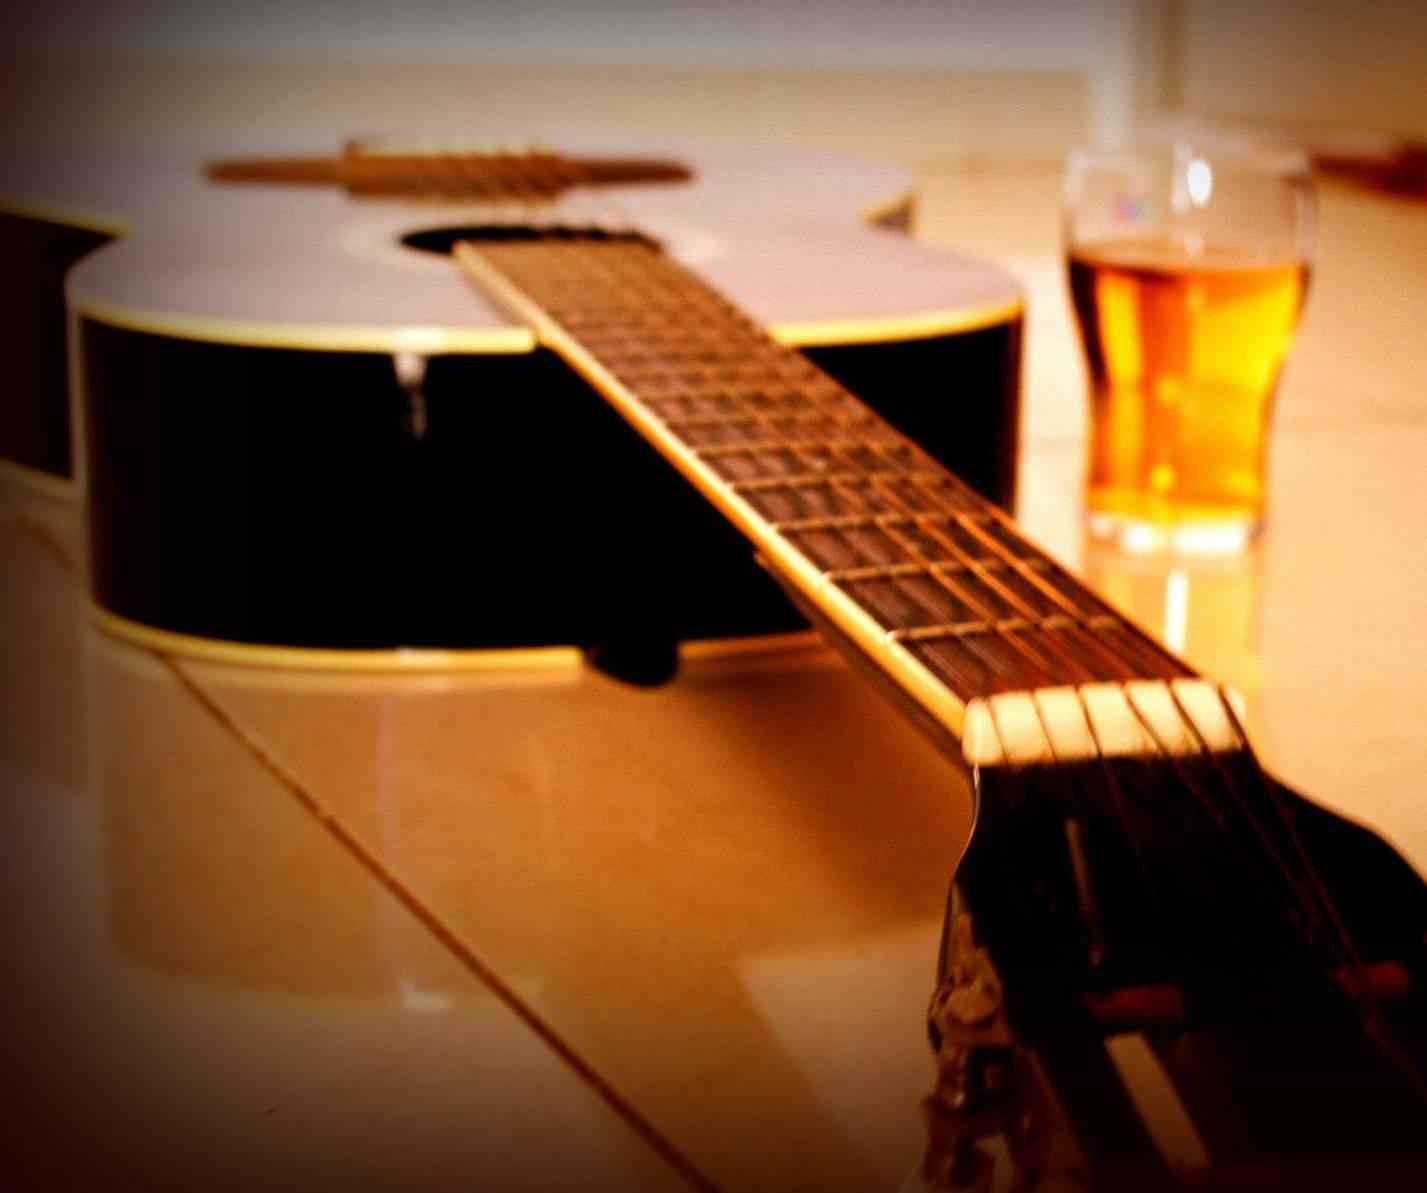 guitar n beer wallpaper by archanasharad fe free on zedge